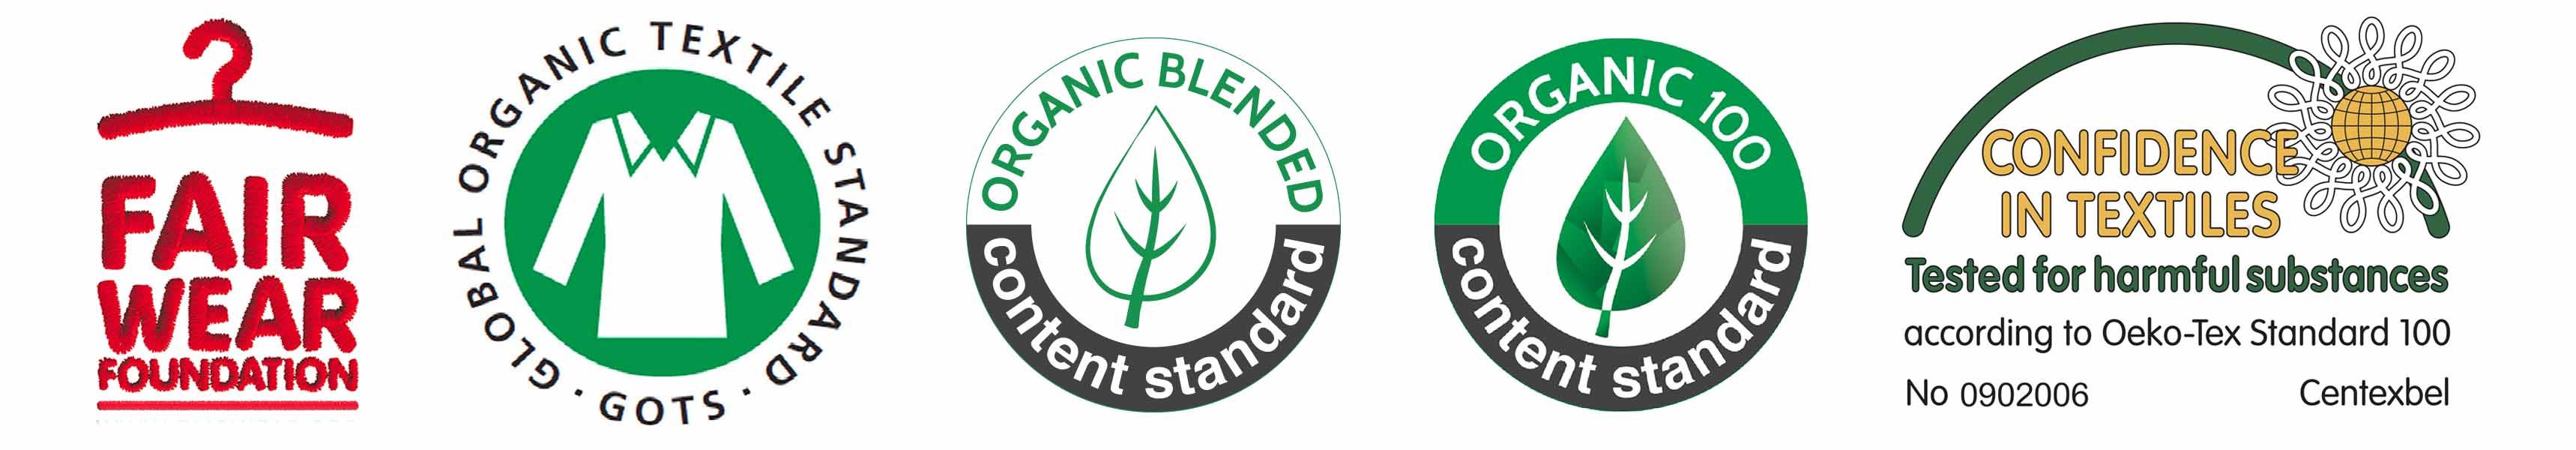 Logos de Fear Wear Foundation, GOTS, OCS Blinded, OCS100 et Confidence in textiles